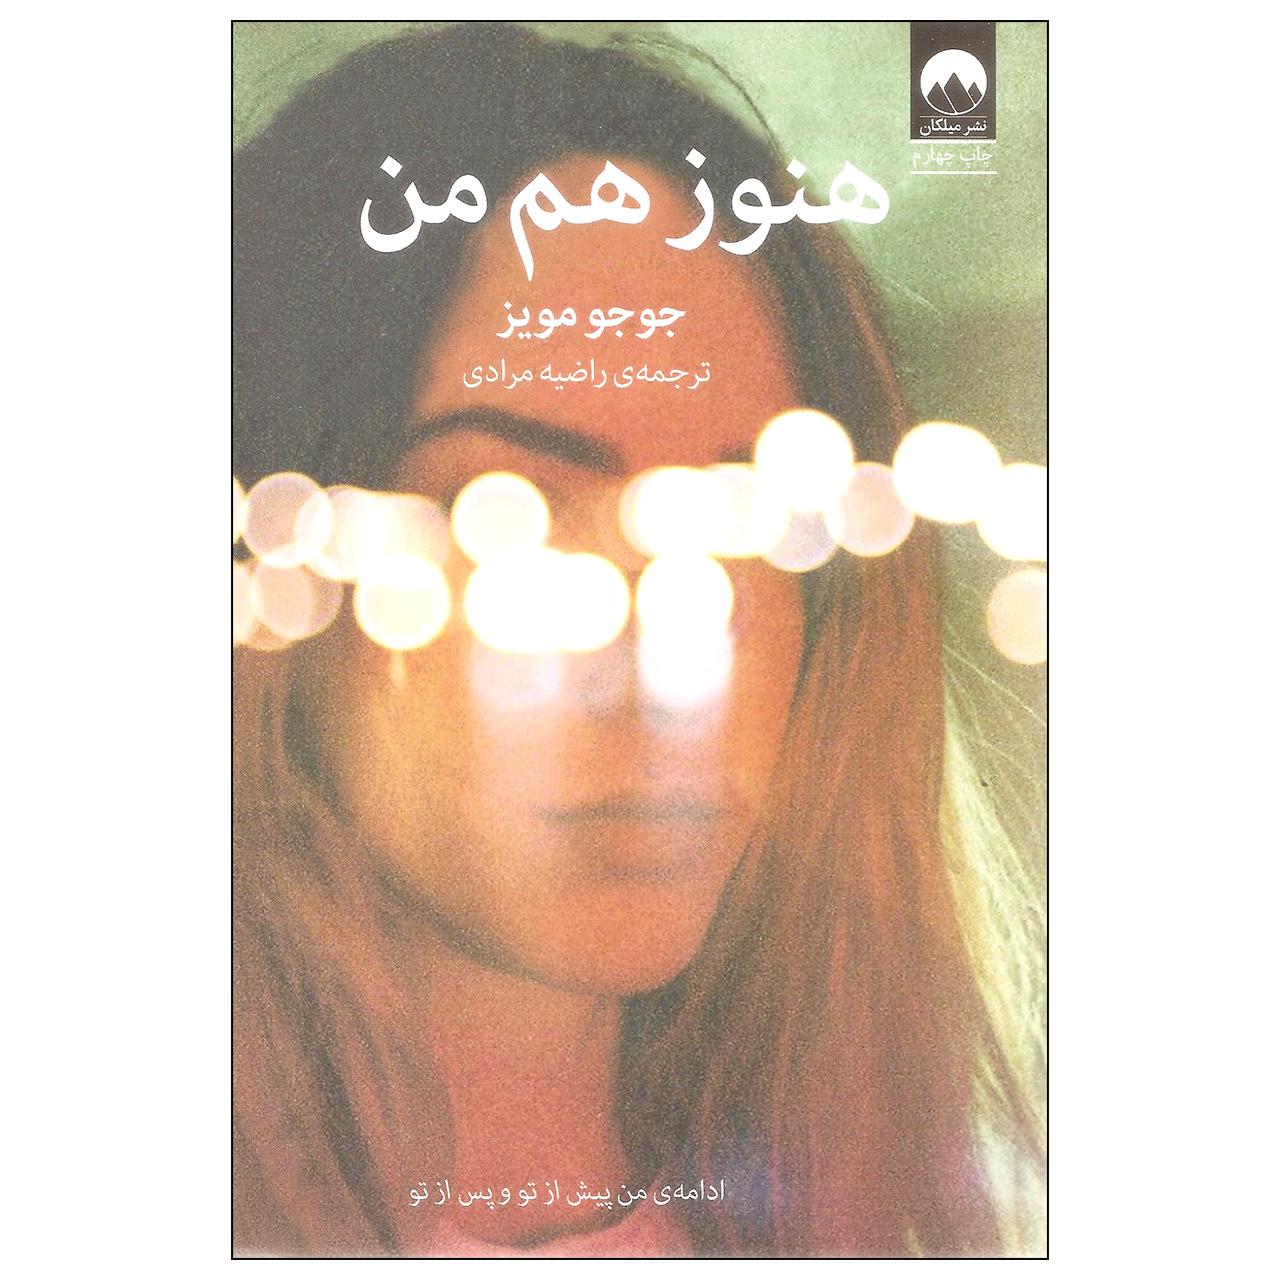 کتاب هنوز هم من اثر جوجو مویز نشر میلکان